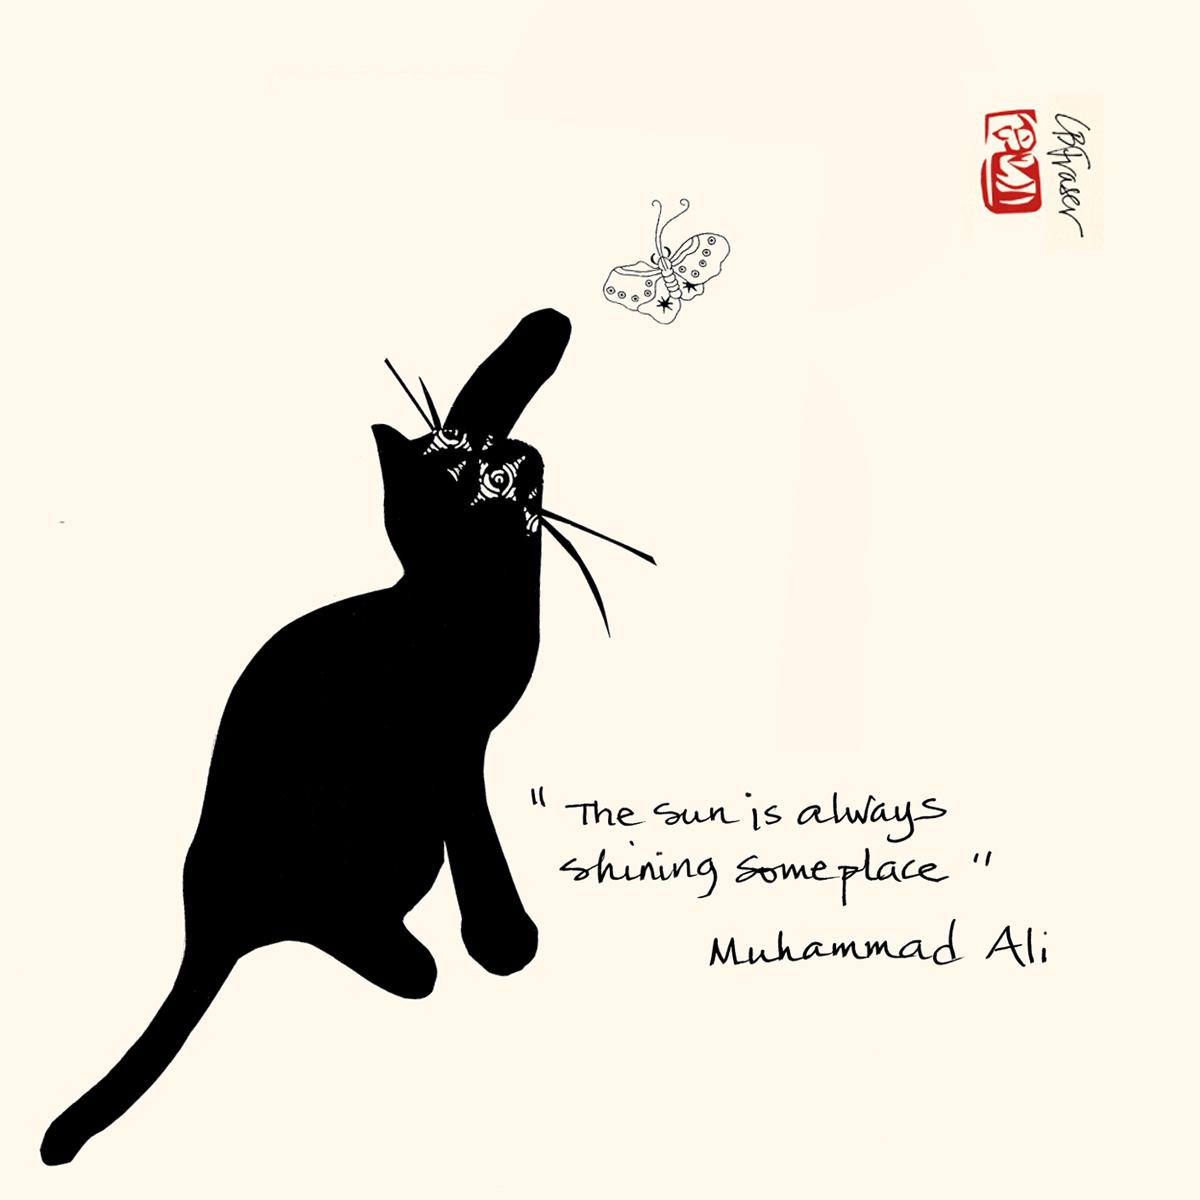 #BlackHistoryMonth #MuhammadAli #Sunshine #Quotations #Quotes #Philantrapist #Activist #Butterfly #AmericanHeartMonth #BHM #Sun #Cat #Art #Collage #Whiskers #CatArt